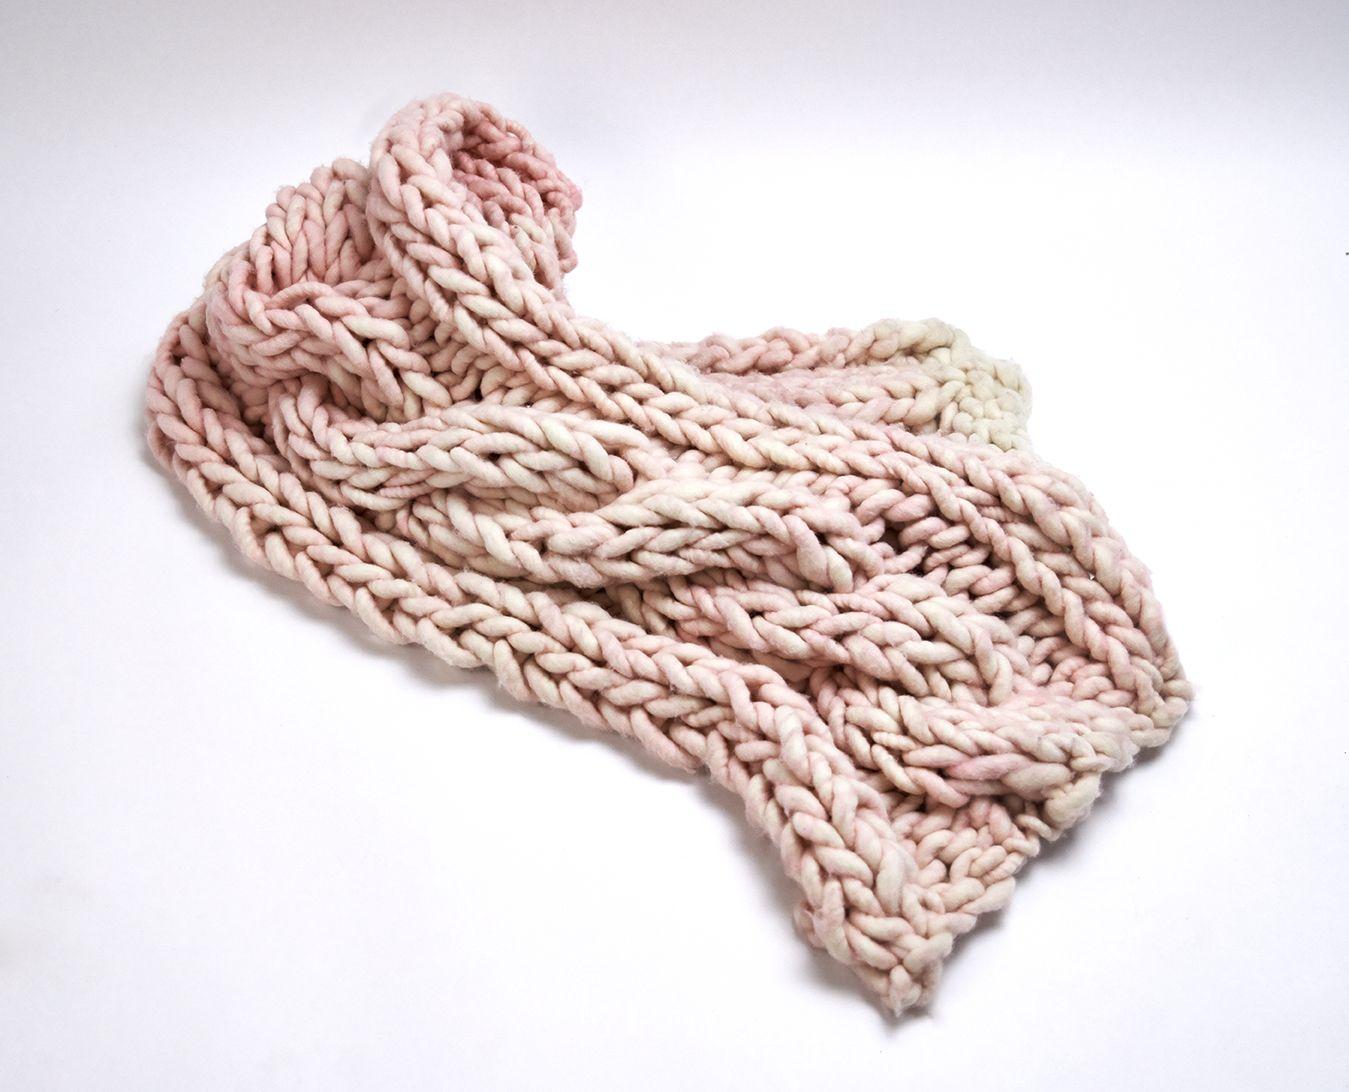 Loopy Mango St. Barth Cable Shawl - available readymade or as DIY Kit on loopymango.com